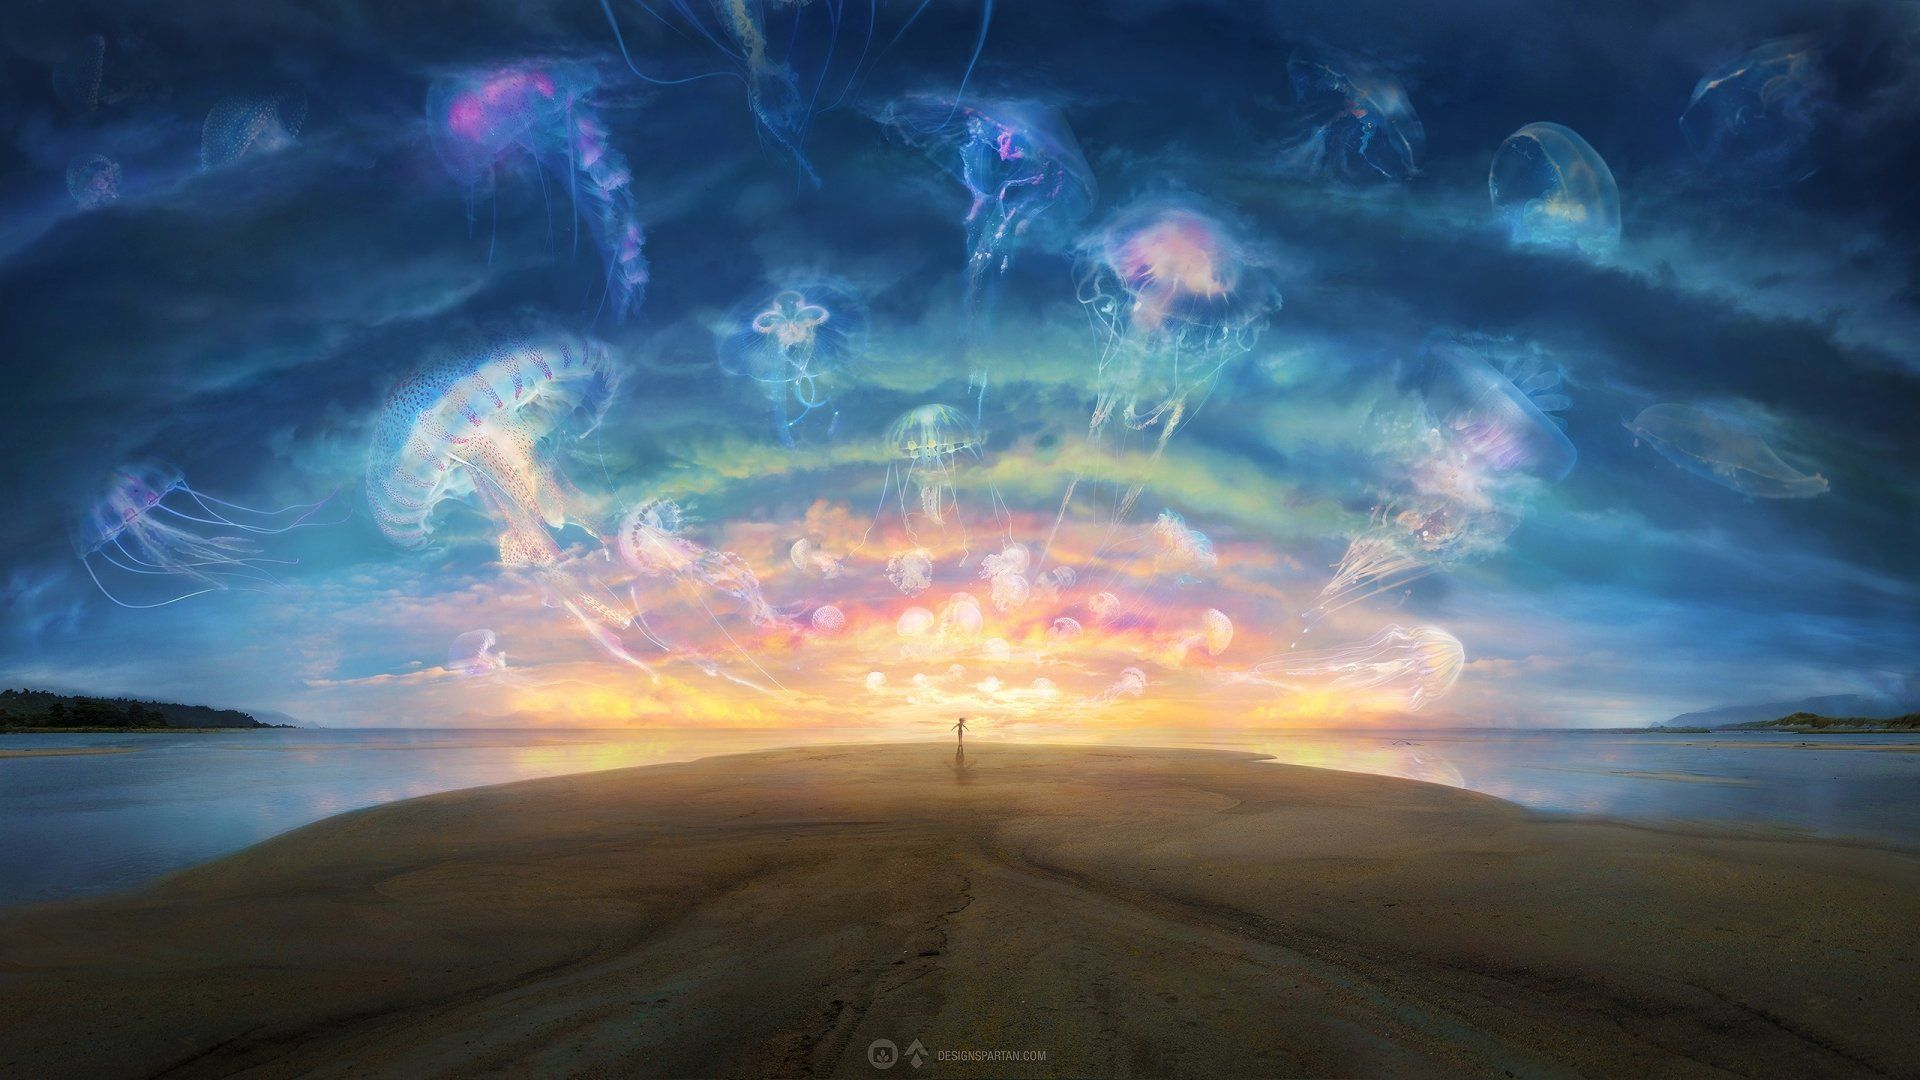 Serene Anime Scenery Wallpaper Clouds Scenery Wallpaper